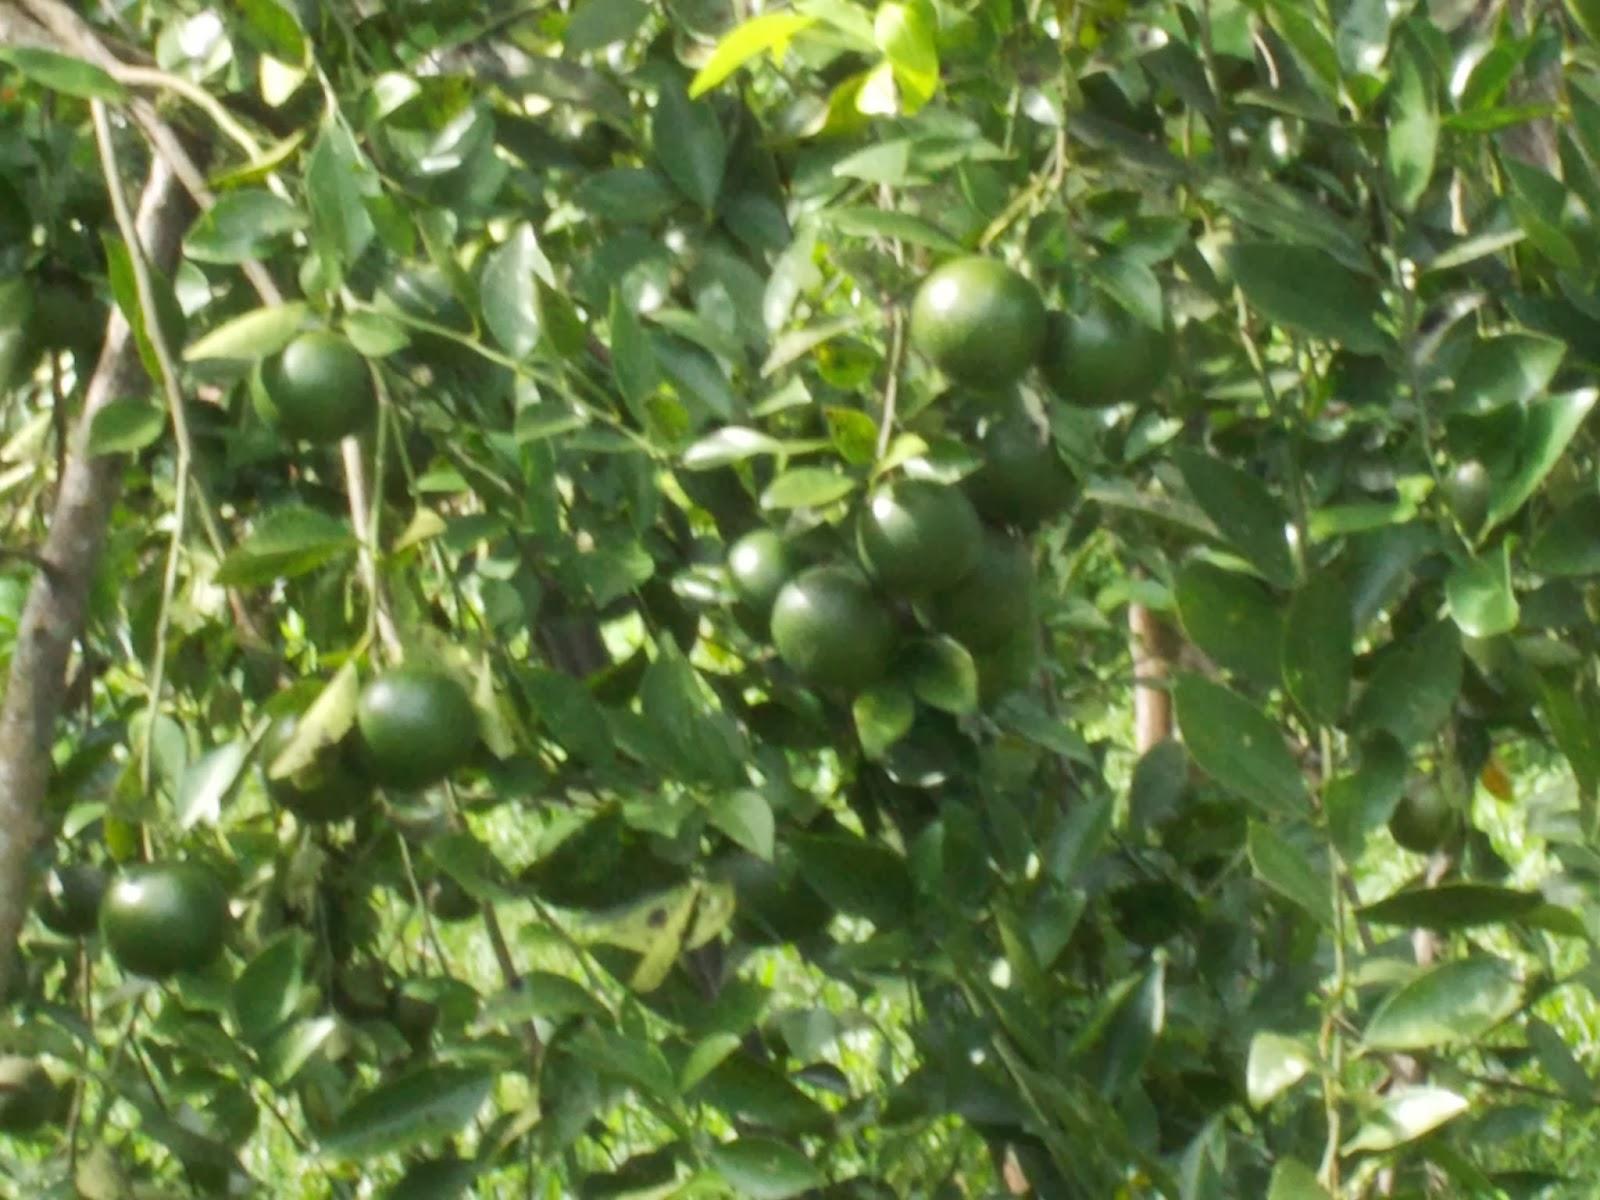 Contoh Proposal Tani Kauripan Pemeliharaan Tanaman Jeruk